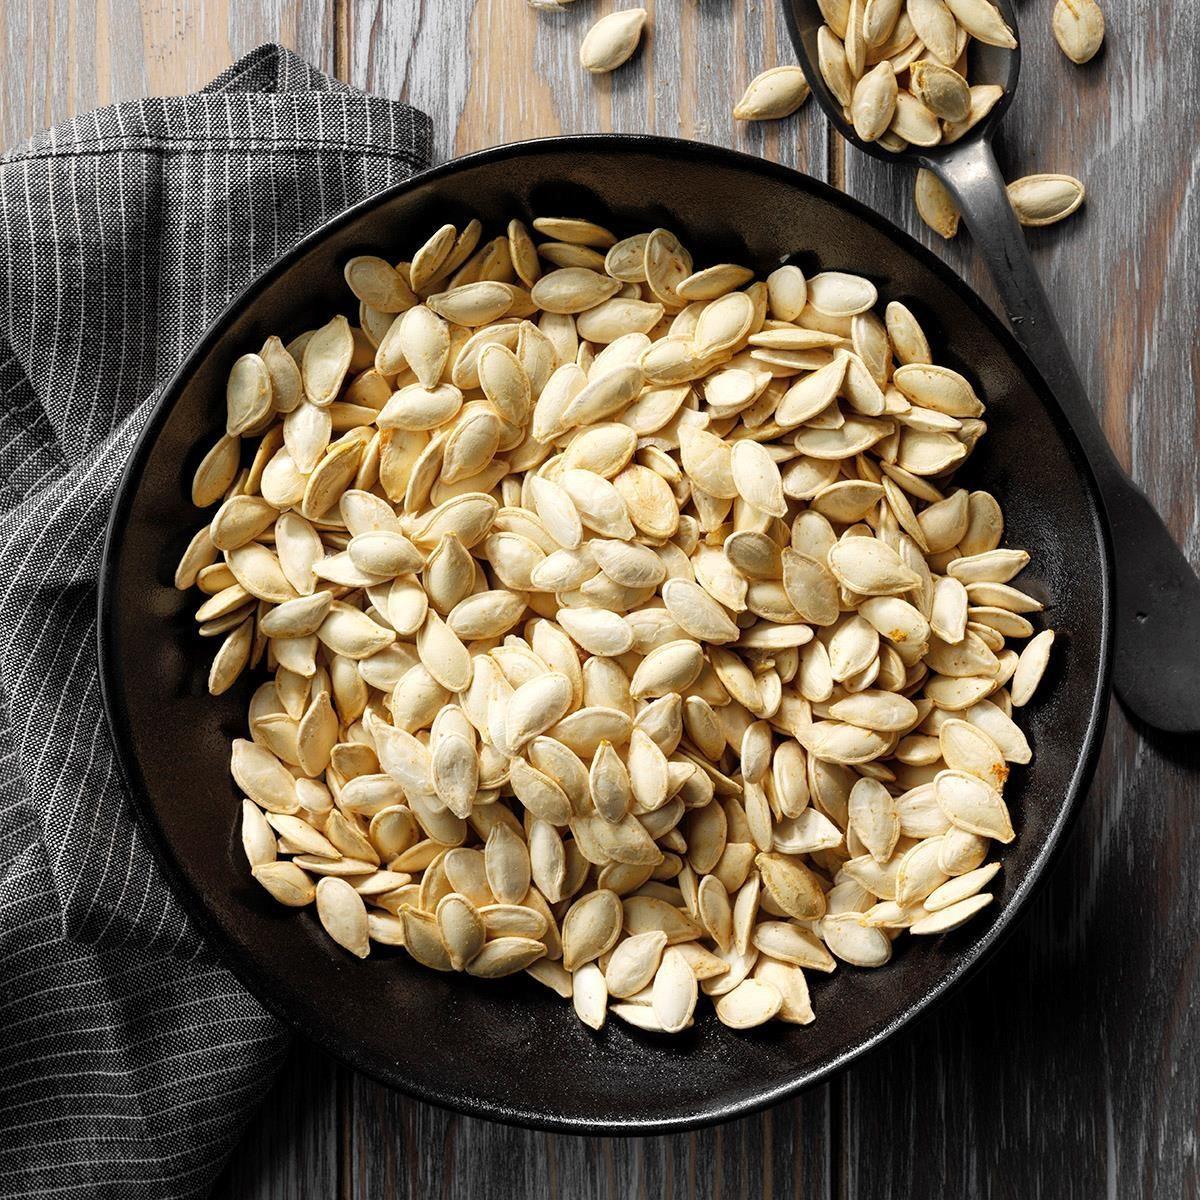 Garlic Pumpkin Seeds Exps Pcbbz19 40746 E09 21 6b 4